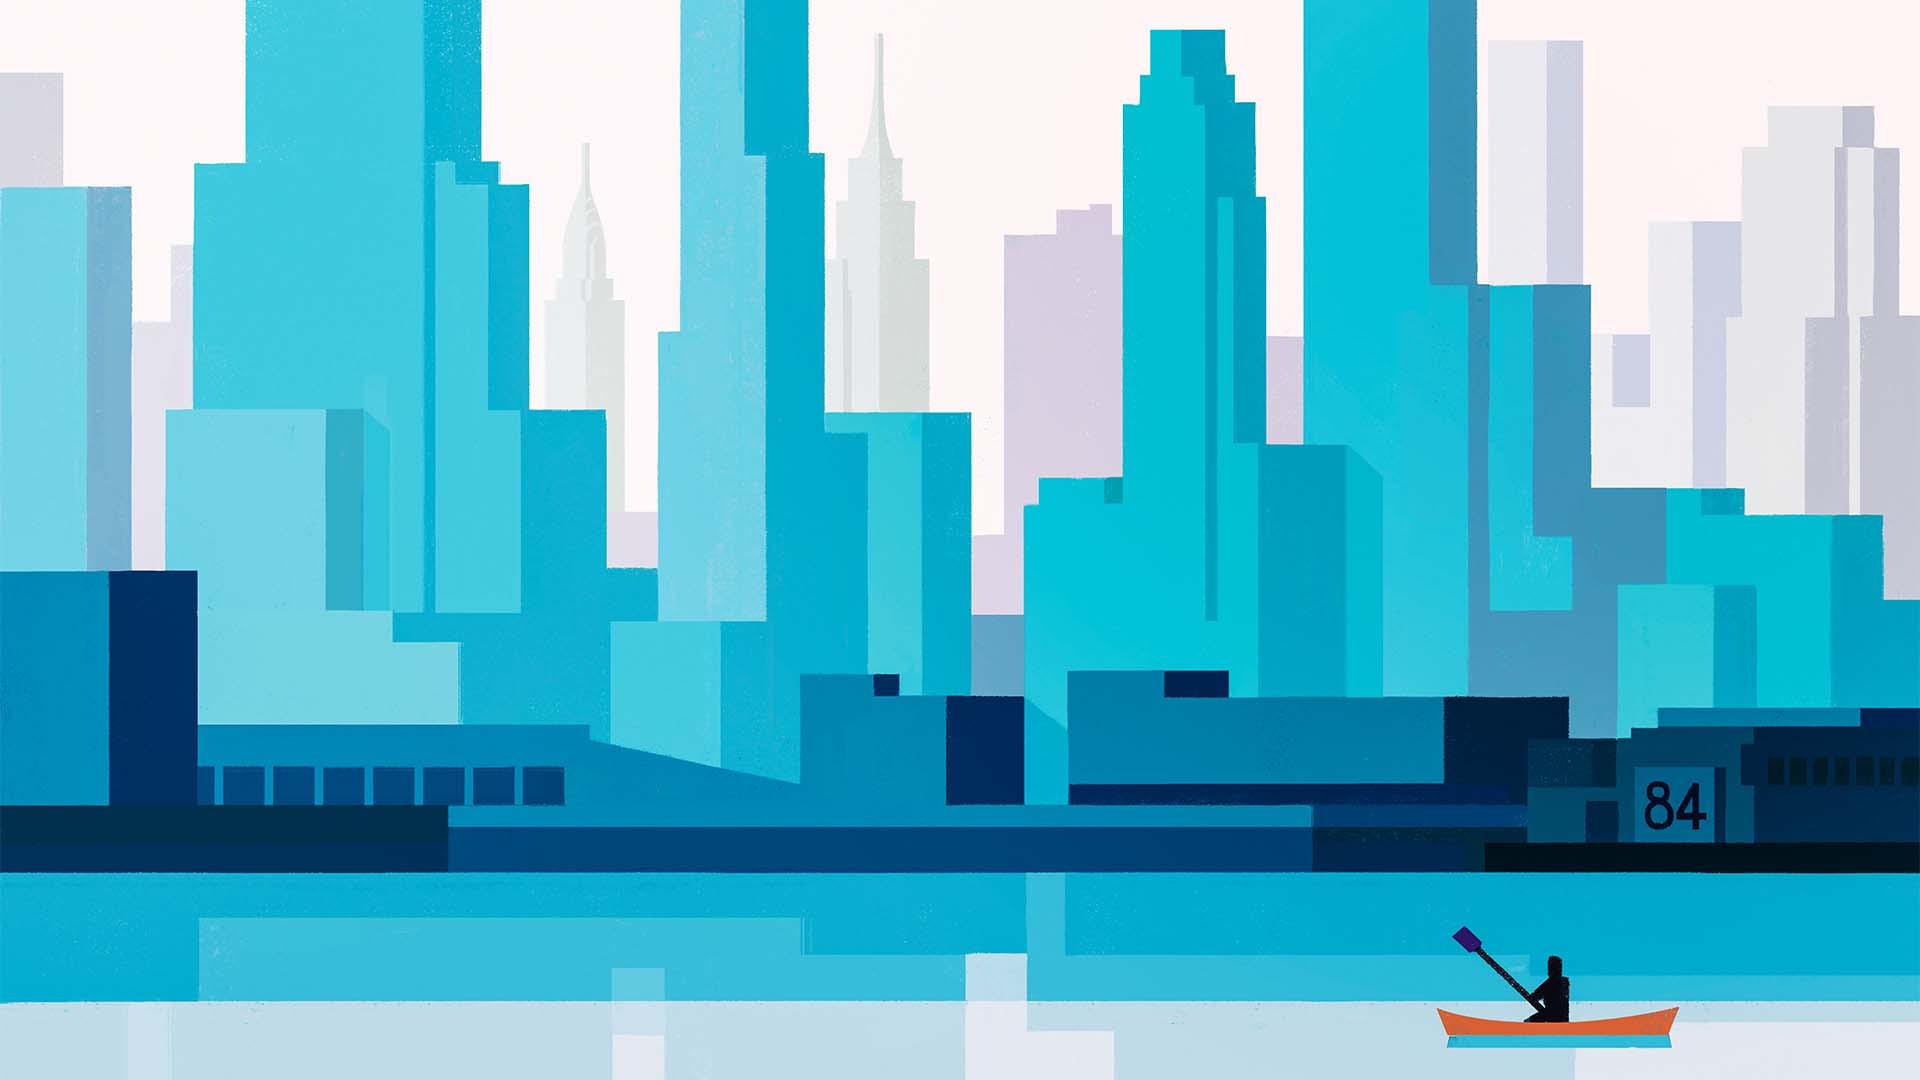 Illustrated impression of kayaking on the Hudson